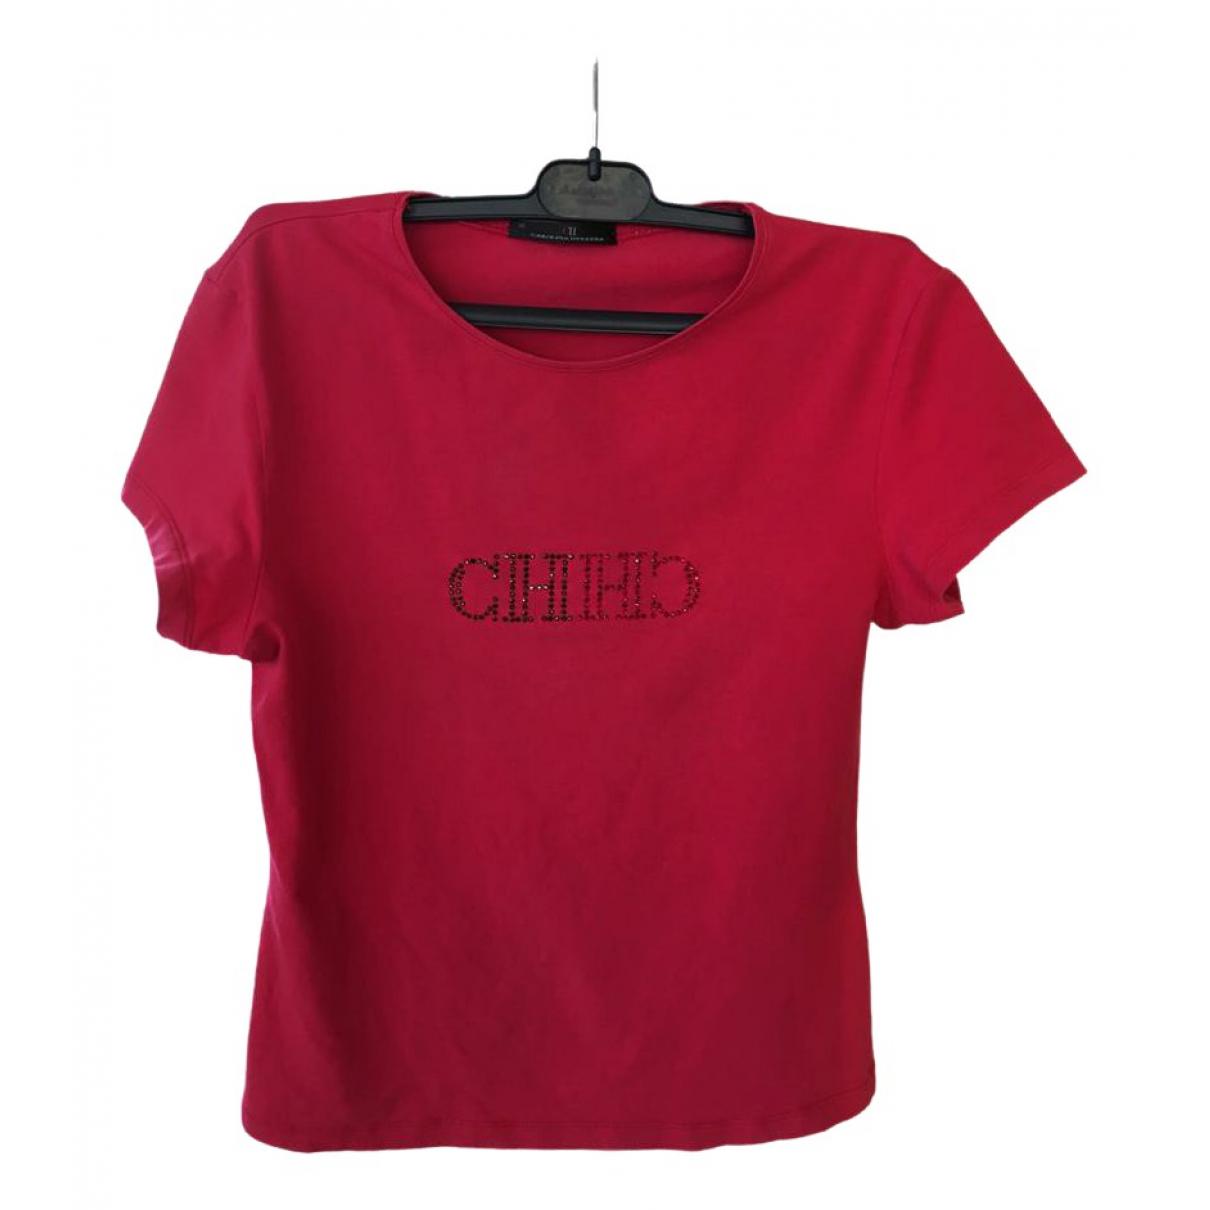 Carolina Herrera - Top   pour femme en coton - rouge